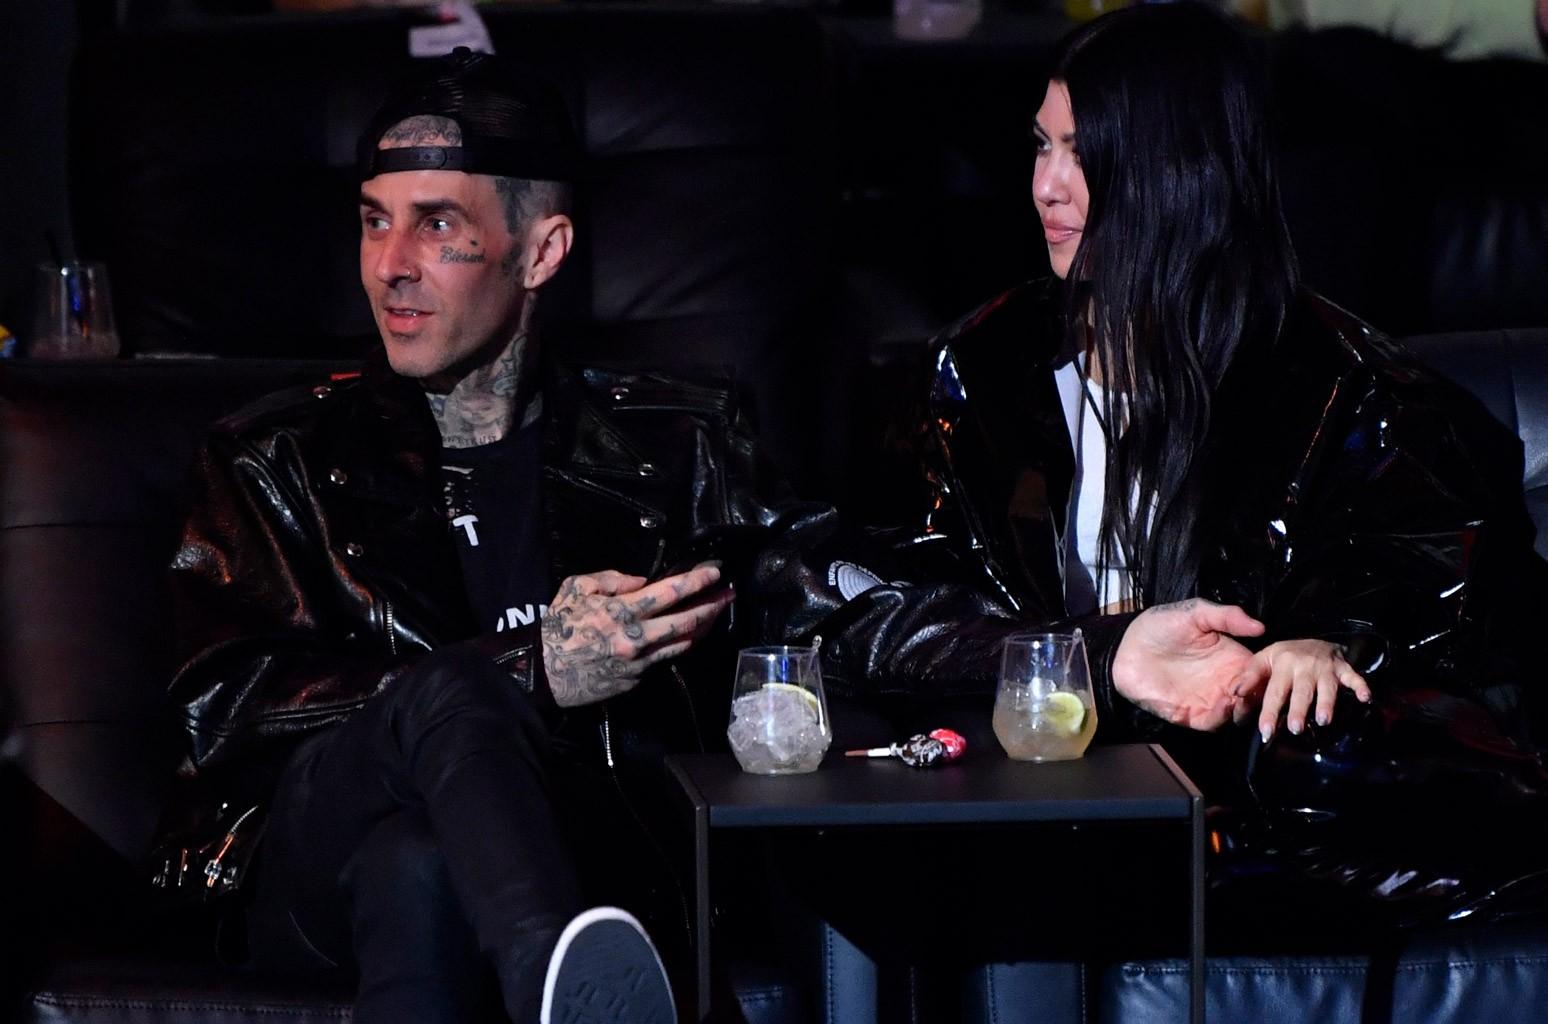 Travis Barker and Kourtney Kardashian